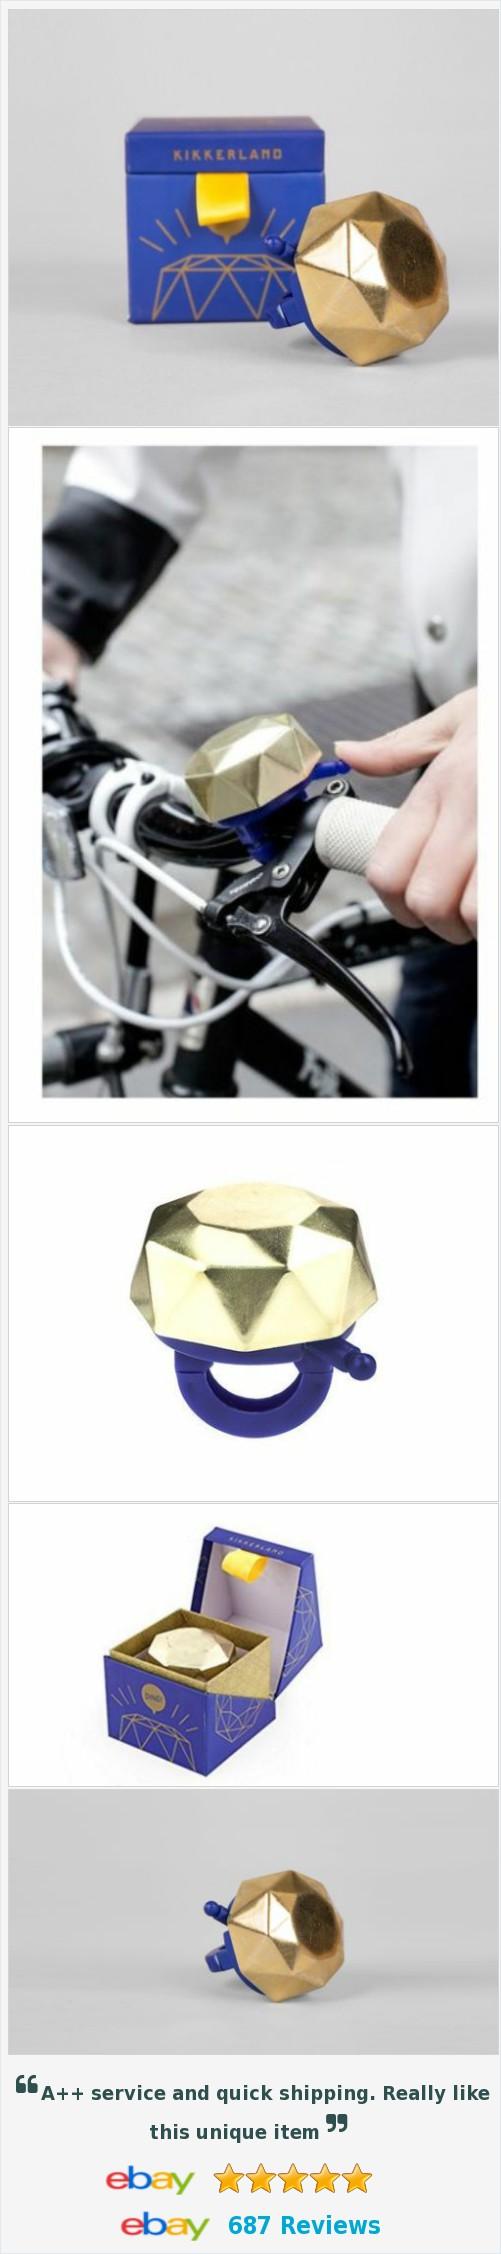 kikkerland RING TO IT Bike Bicycle Bell #BB40 Golden Jewel boxed StudioFrisco